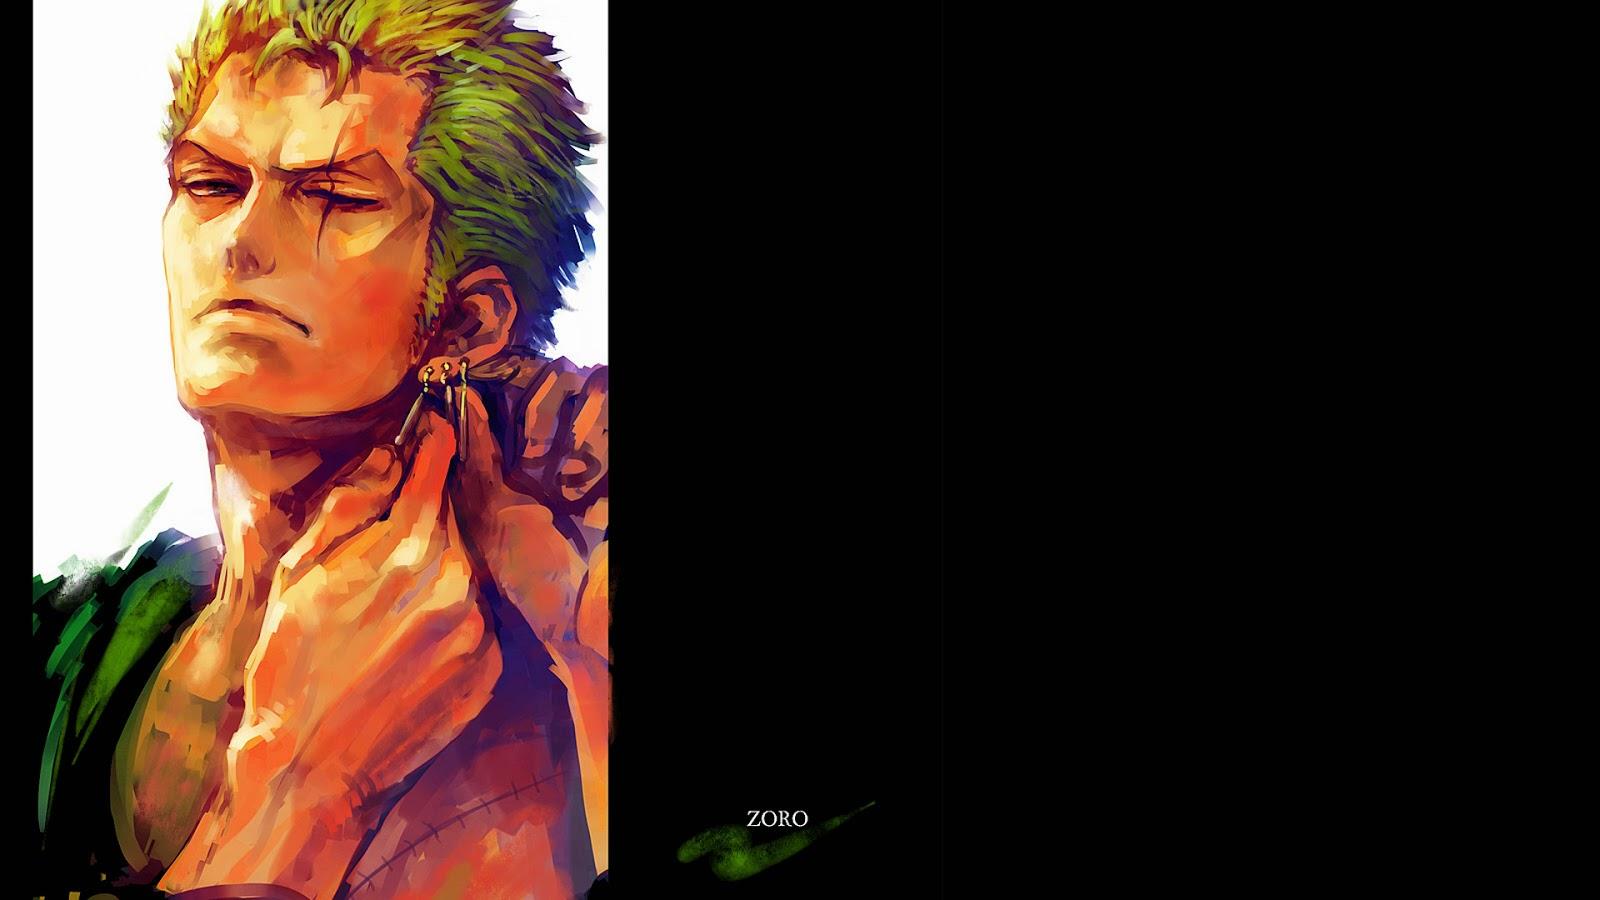 Roronoa Zoro After 2 Years One Piece Anime Hd Wallpaper 1920x1080